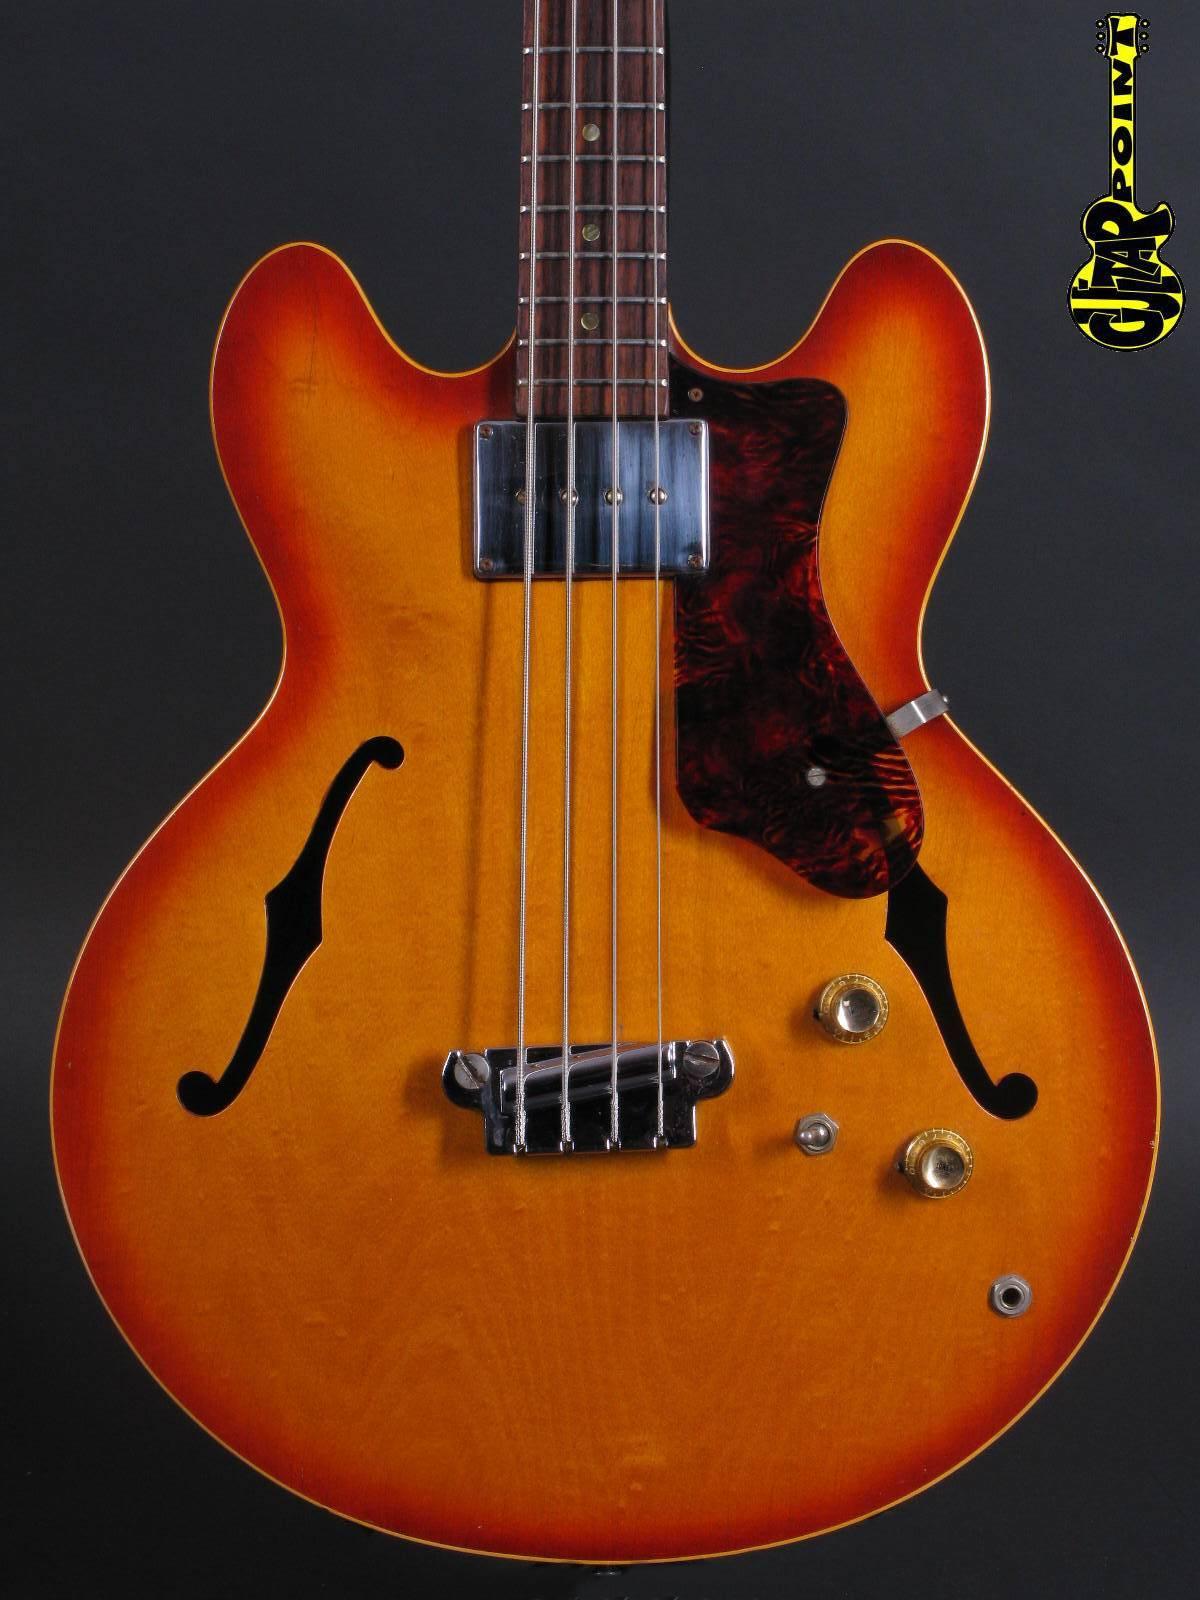 1966 Epiphone Rivoli Bass - Sunburst